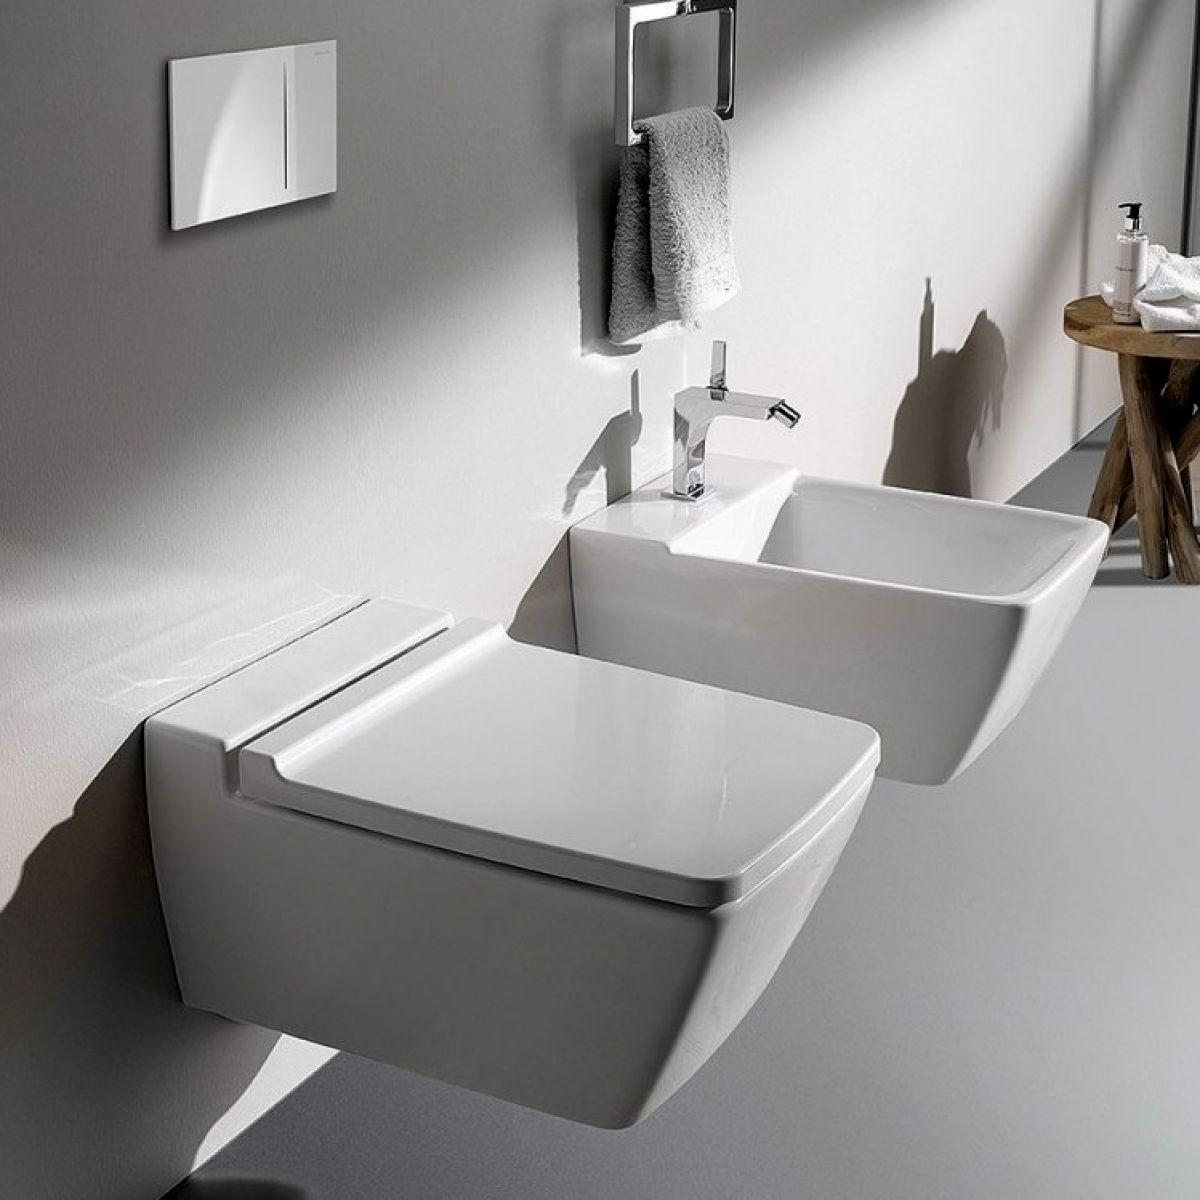 Geberit Xeno2 Wall Hung Toilet Rimfree Bathrooms Direct